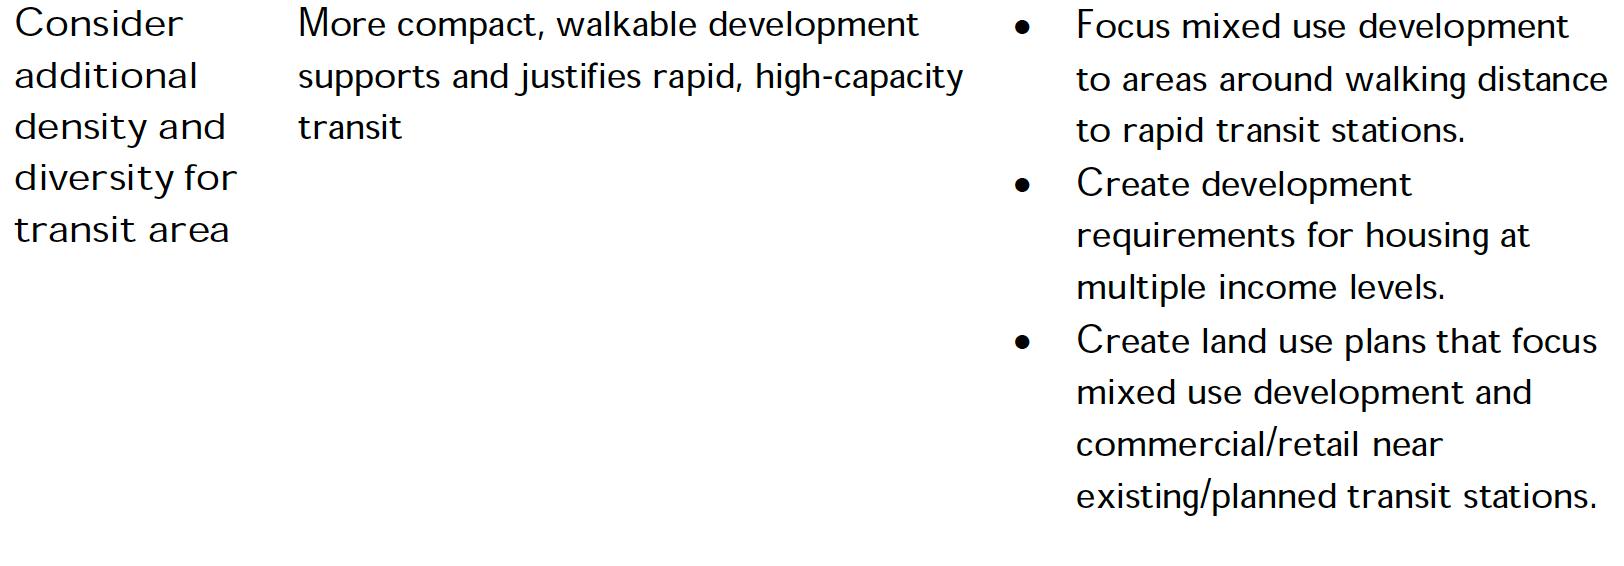 Transit Center Development - https://www.johnscreekpost.com